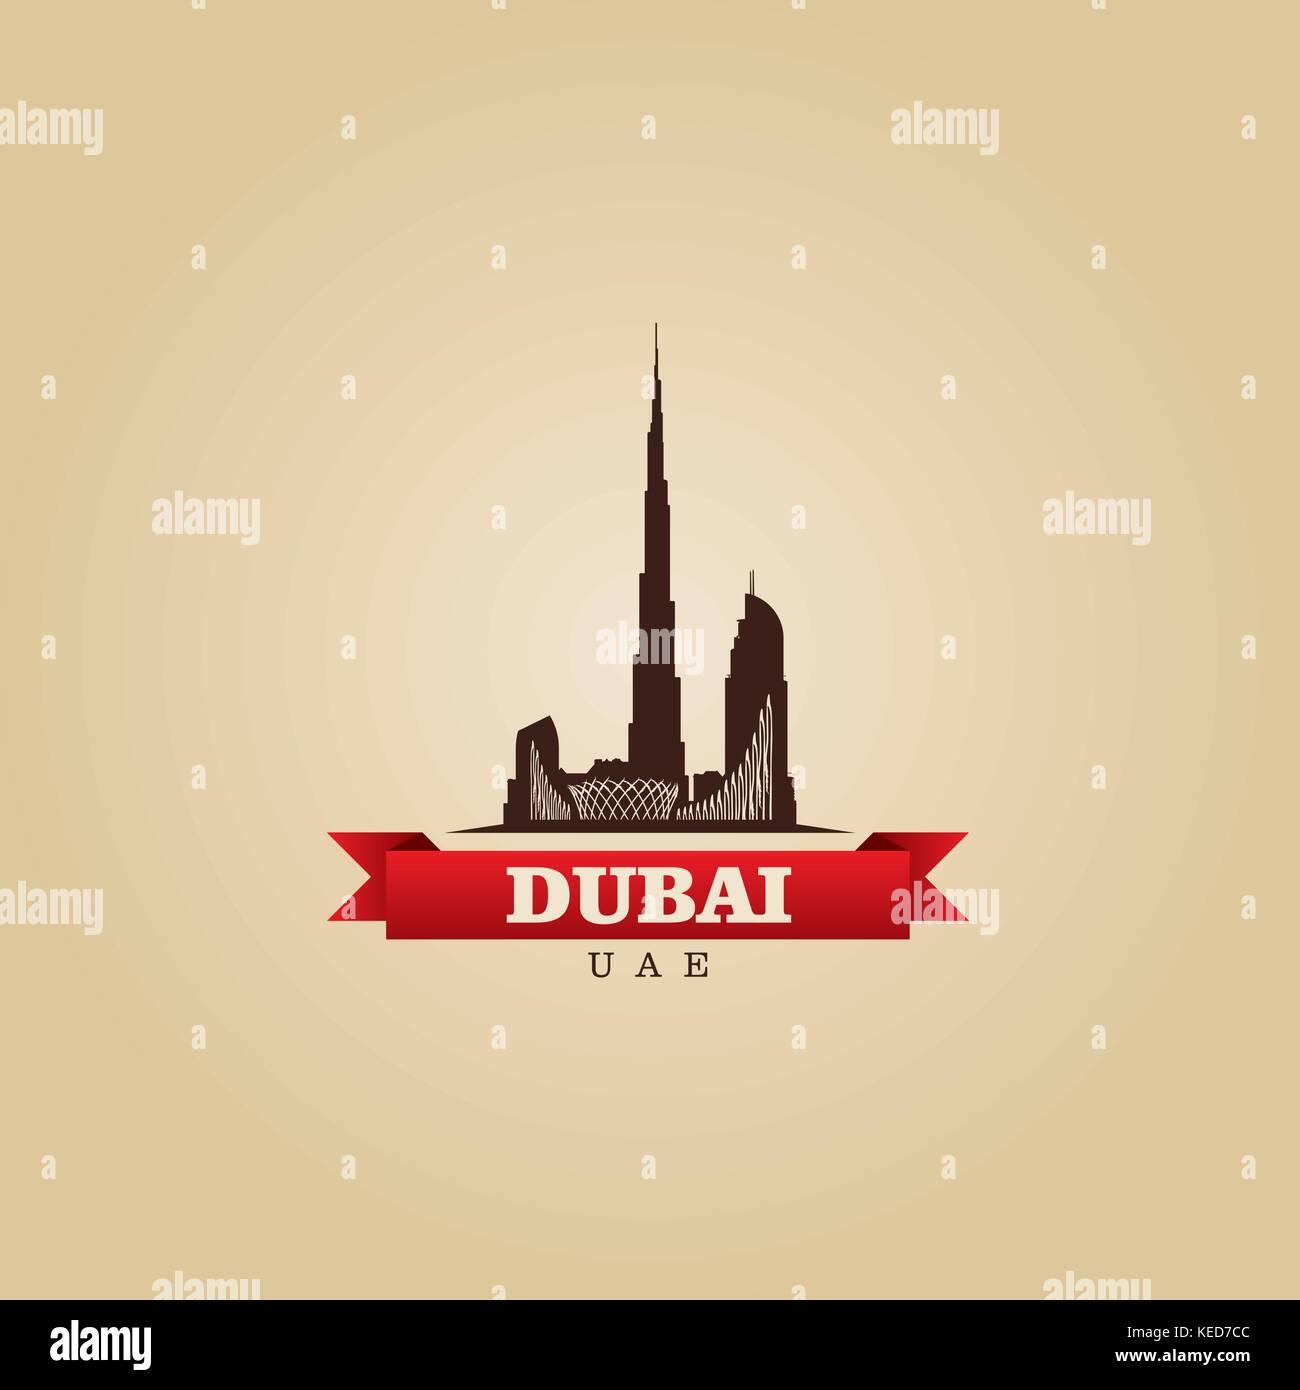 Dubai UAE city symbol vector illustration Stock Vector